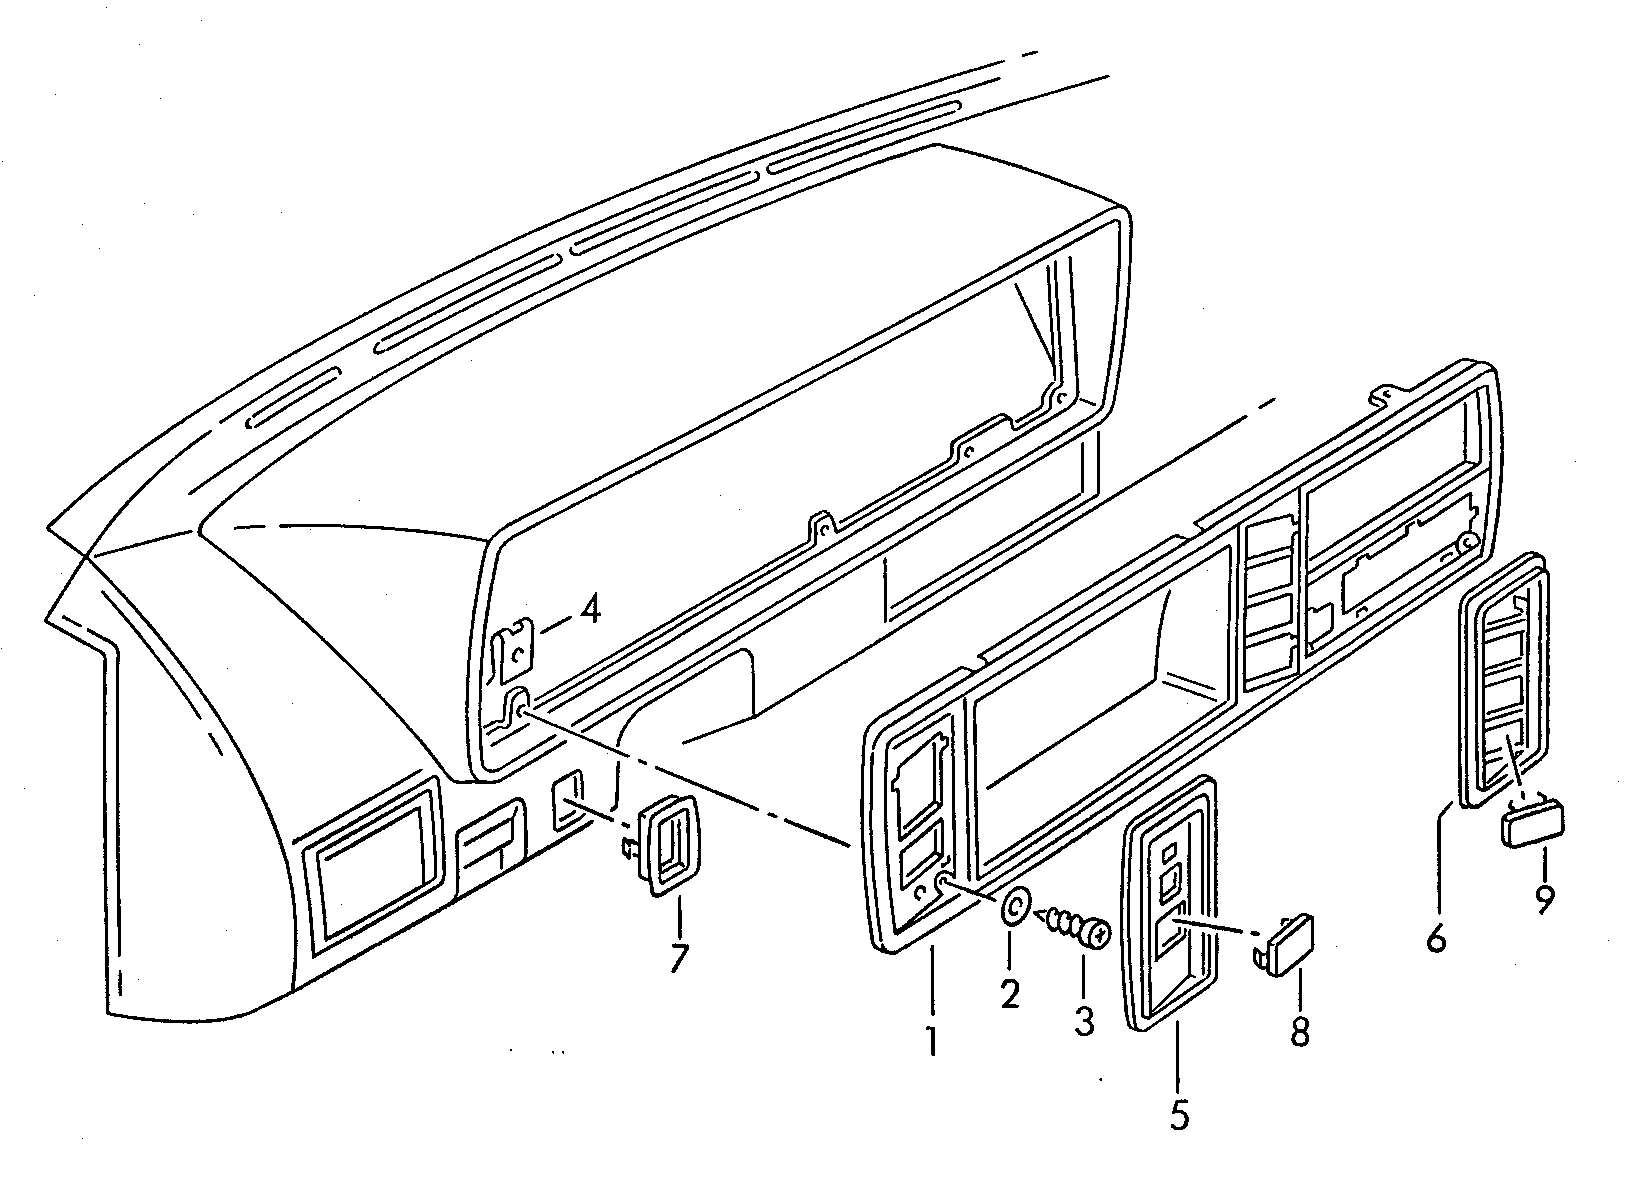 Pin On Vw Cabriolet Repair